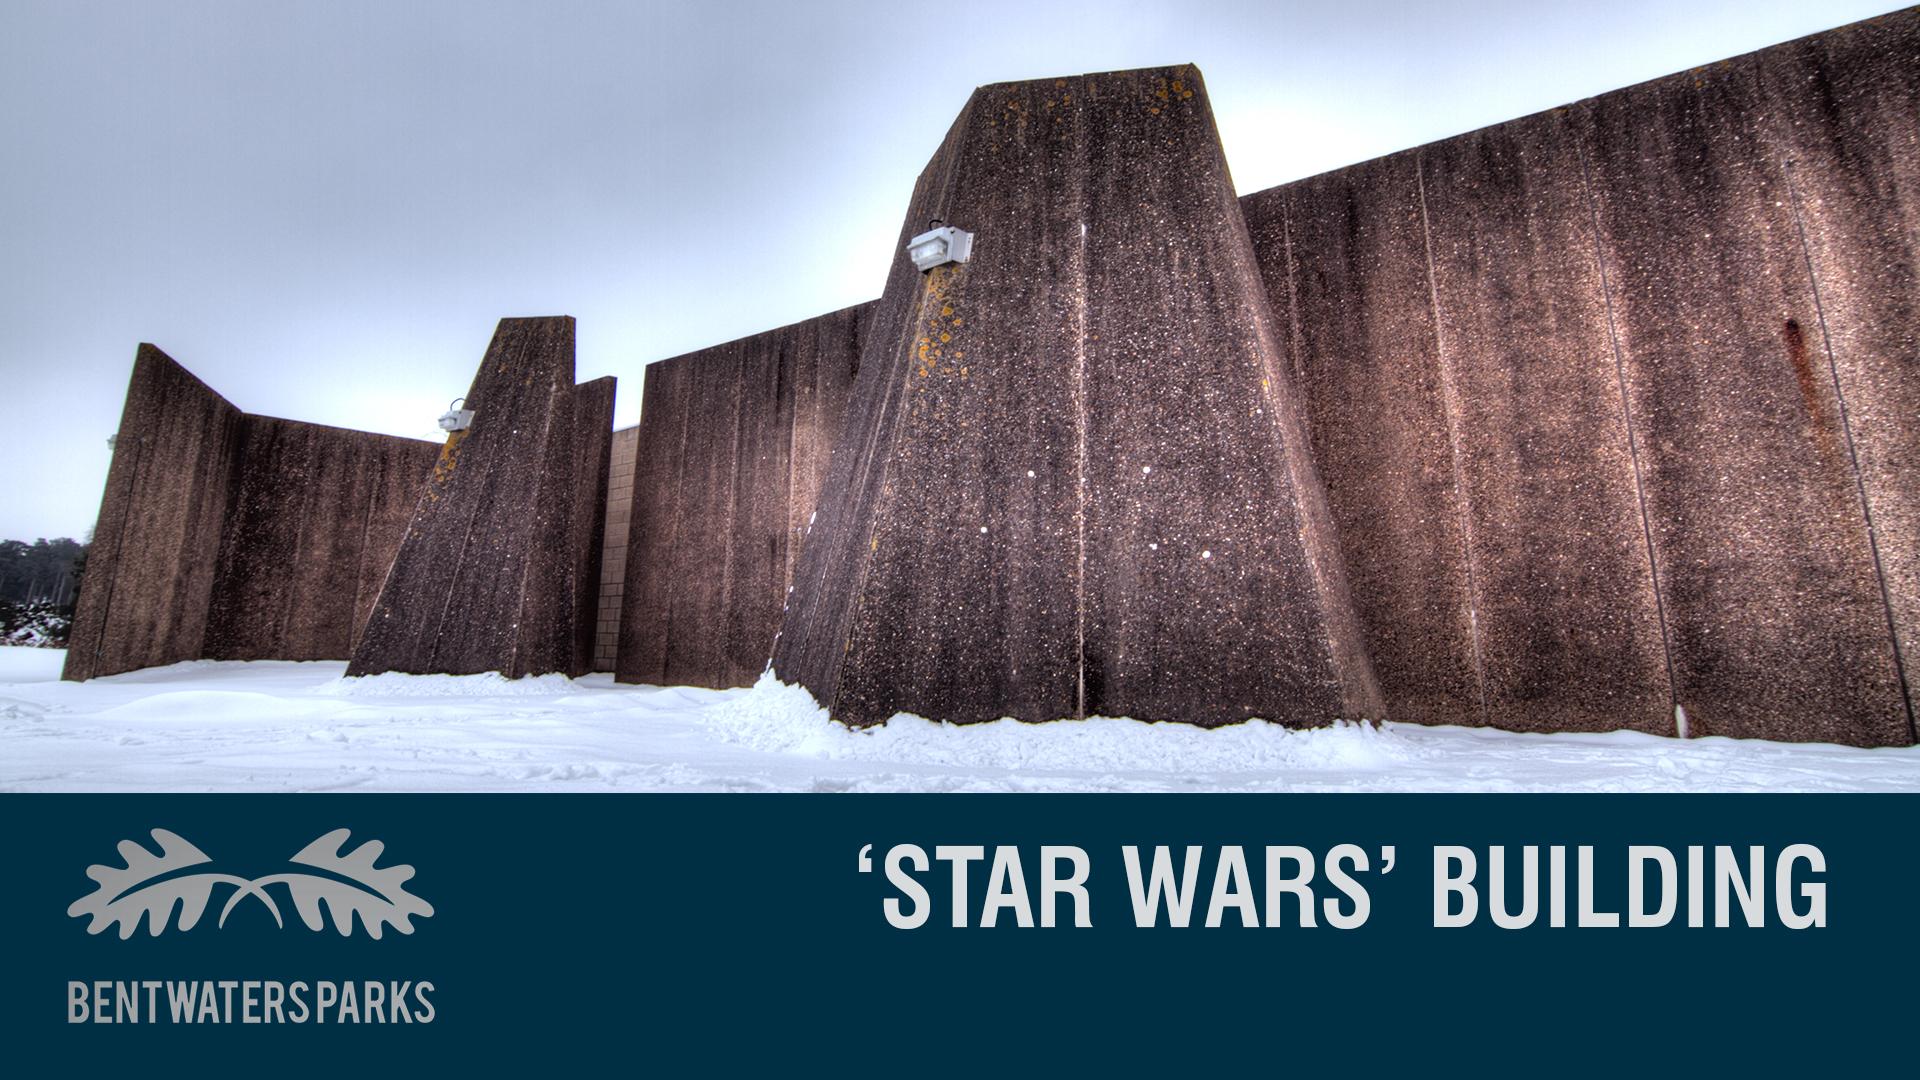 'STAR WARS' BUILDING